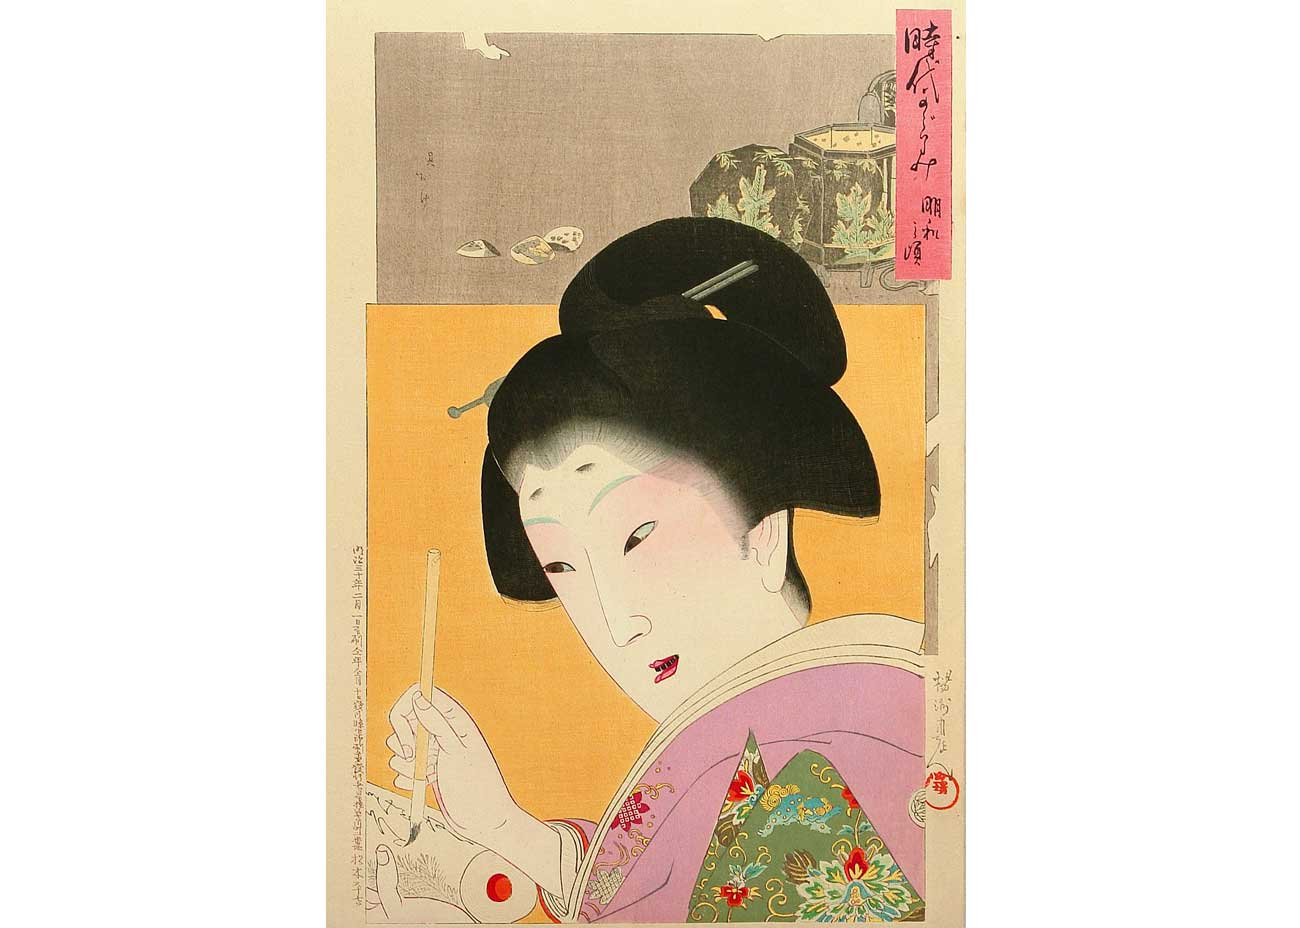 Mirror of the Ages, Meiwa, Woodblock Print by Toyohara Chikanobu, 1897